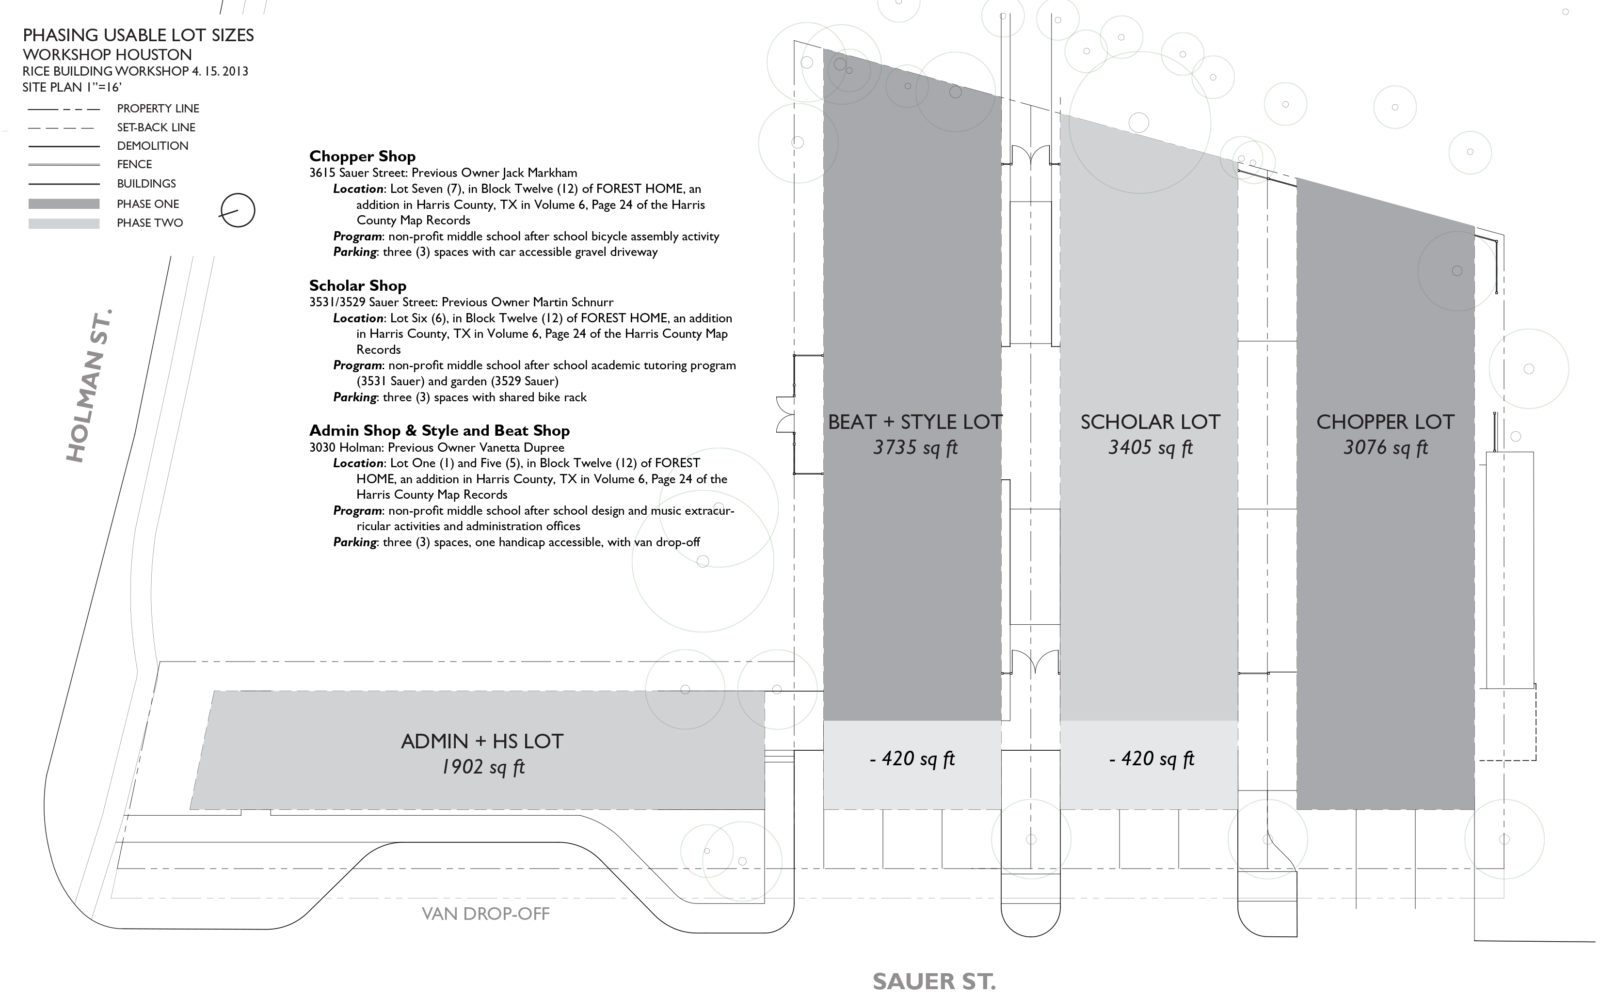 Workshop Houston Plan Diagram 3